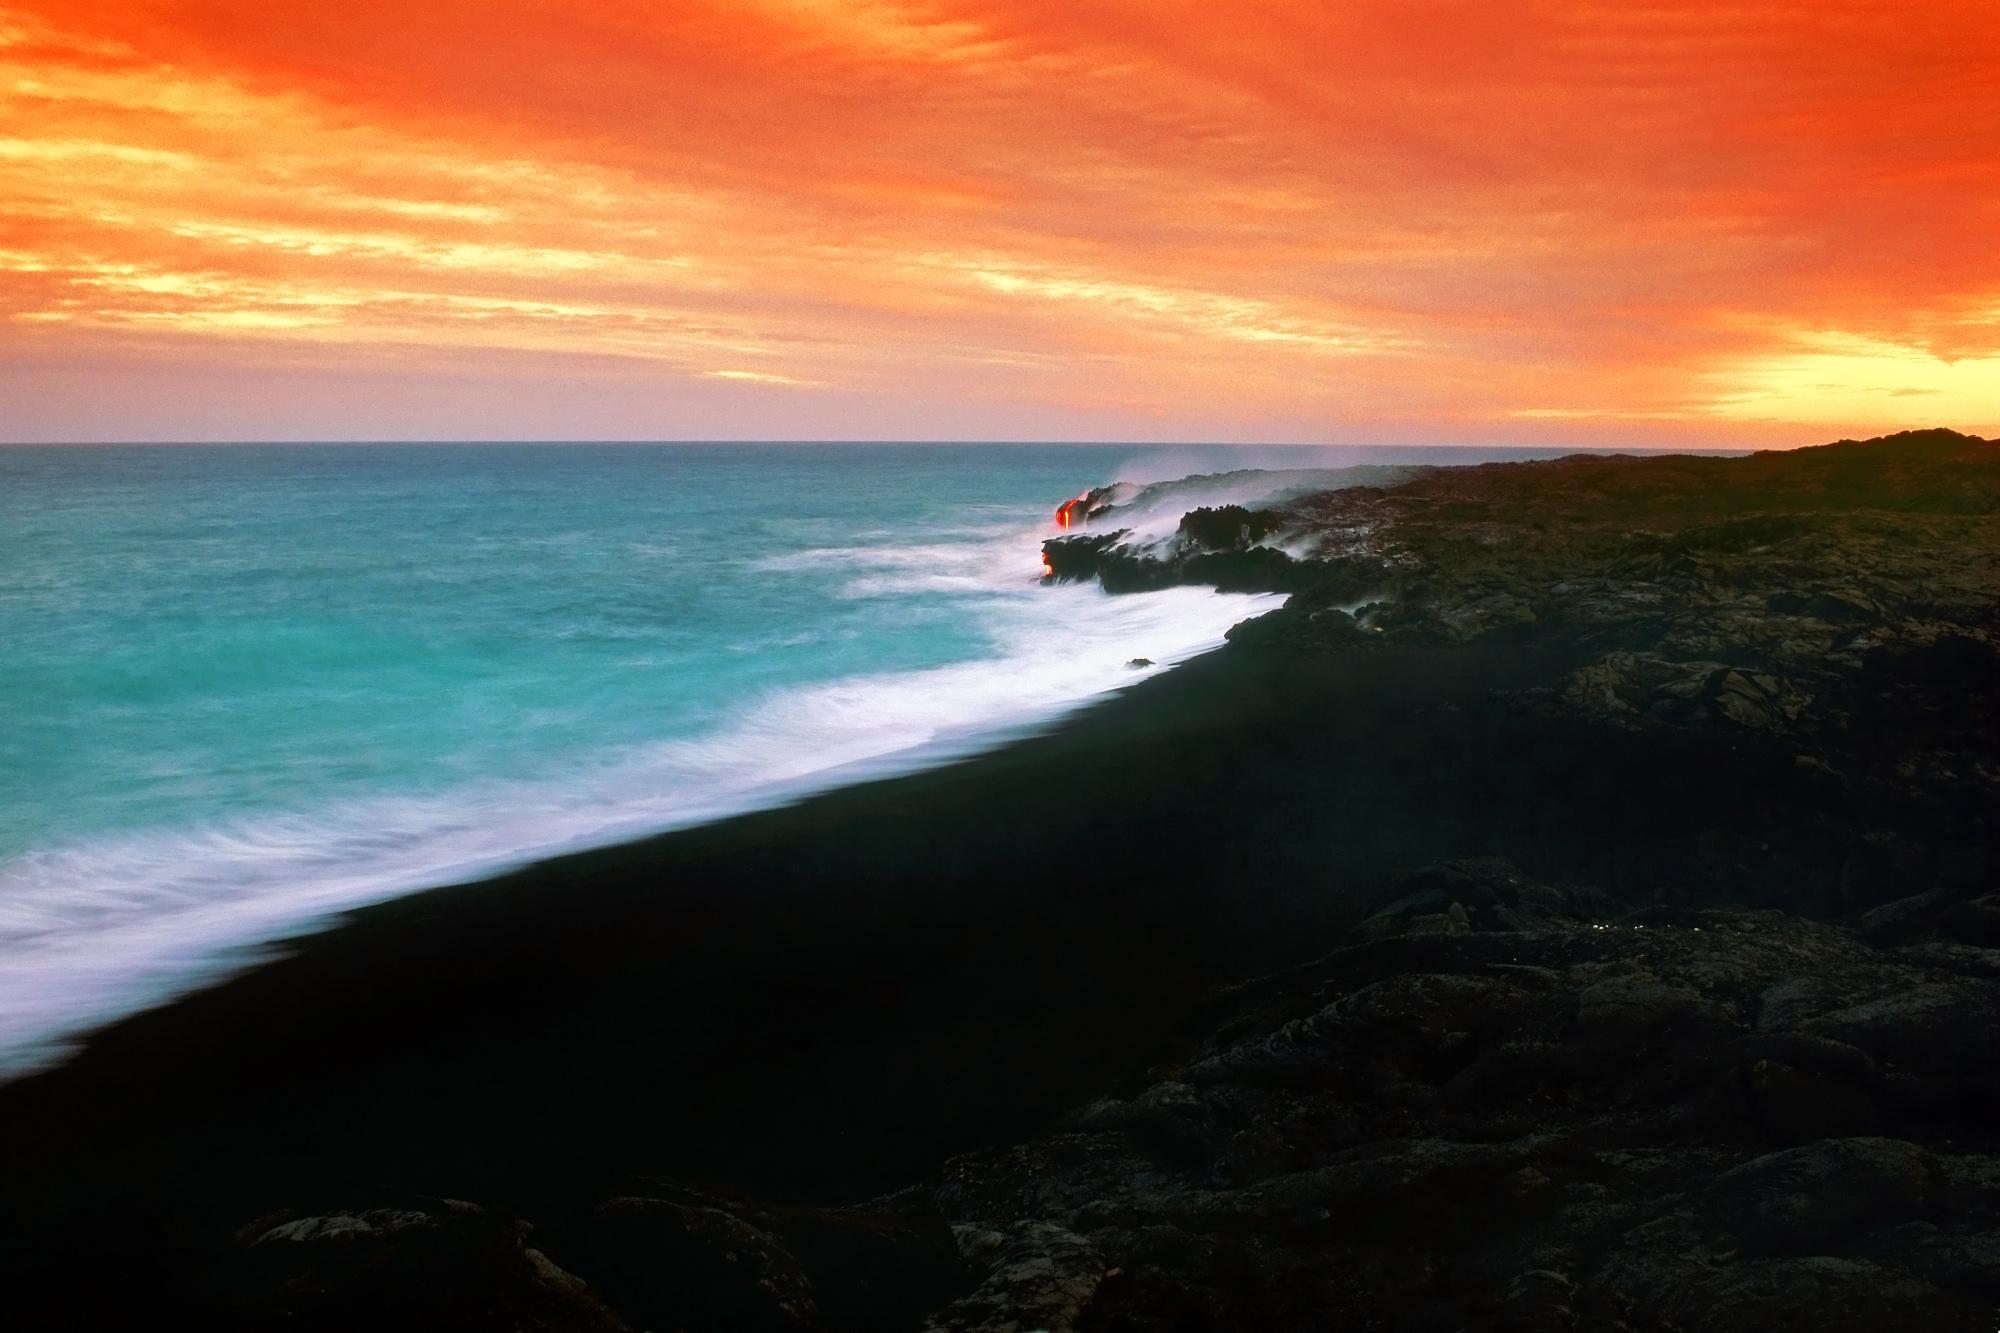 Sunset over a lava fields in Hawaii wallpaper   Beach Wallpapers 2000x1333